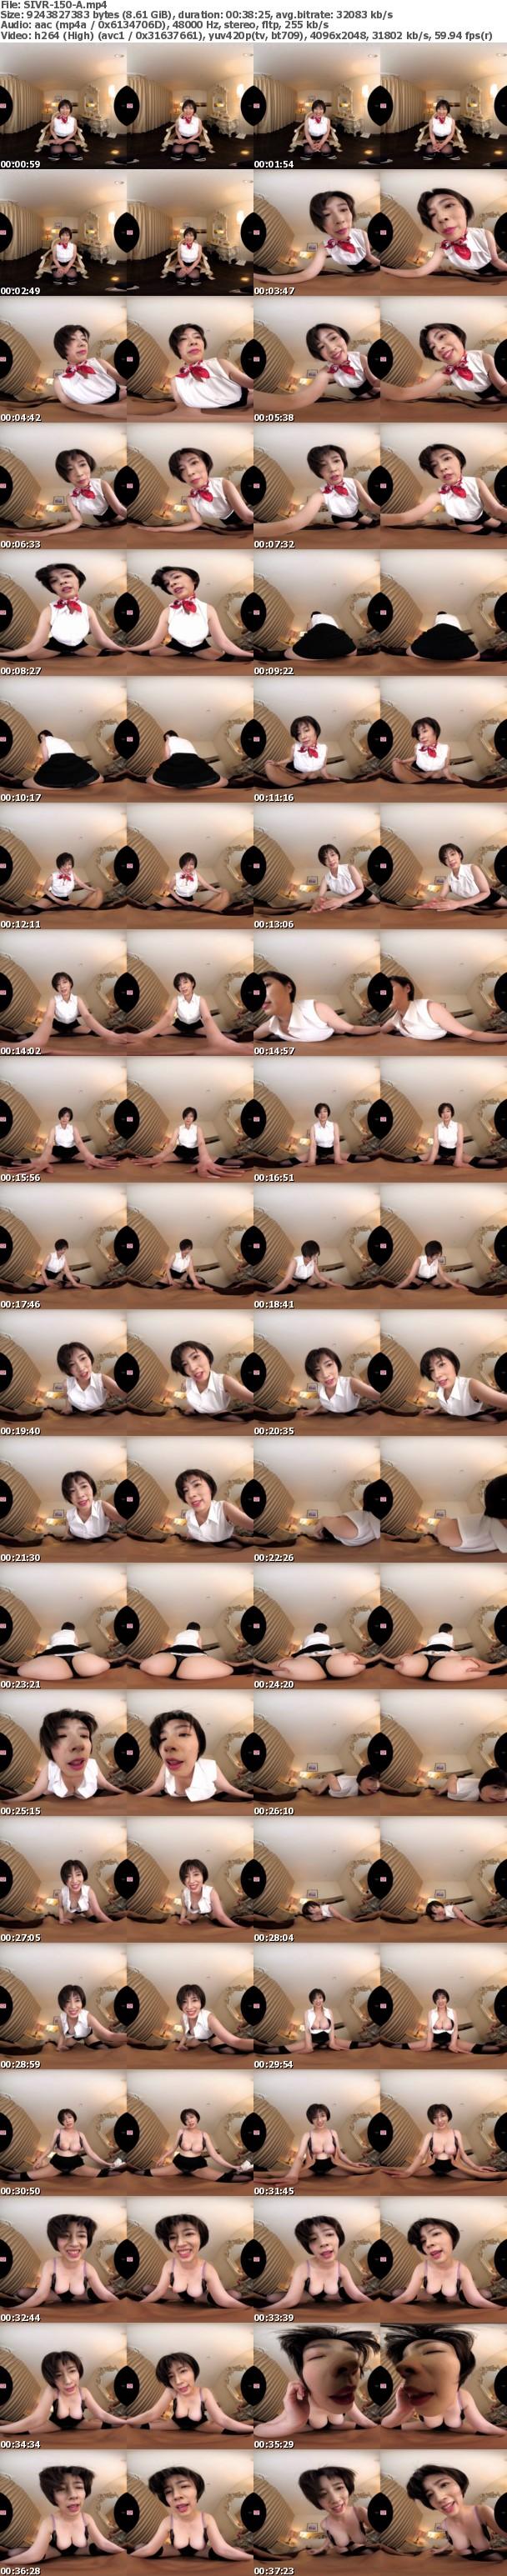 (VR) SIVR-150 天井特化×メンズエステ×奥田咲 あなたは寝てるだけ。爆乳ド迫力アングル覆い被さり騎乗位スペシャル